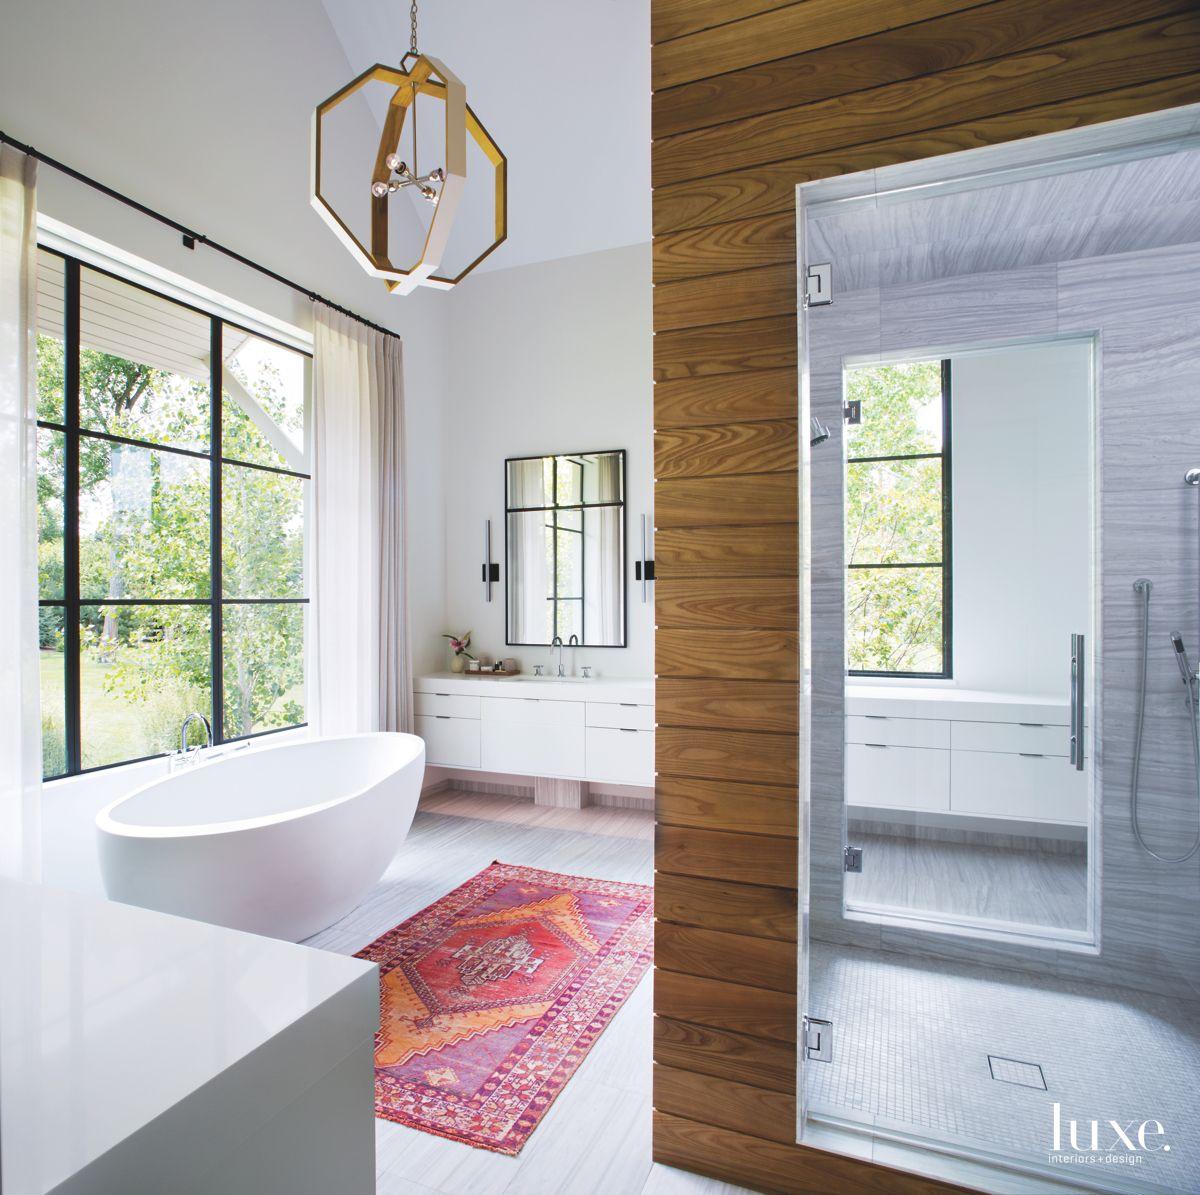 Master Bathroom with a Vibrant Rug